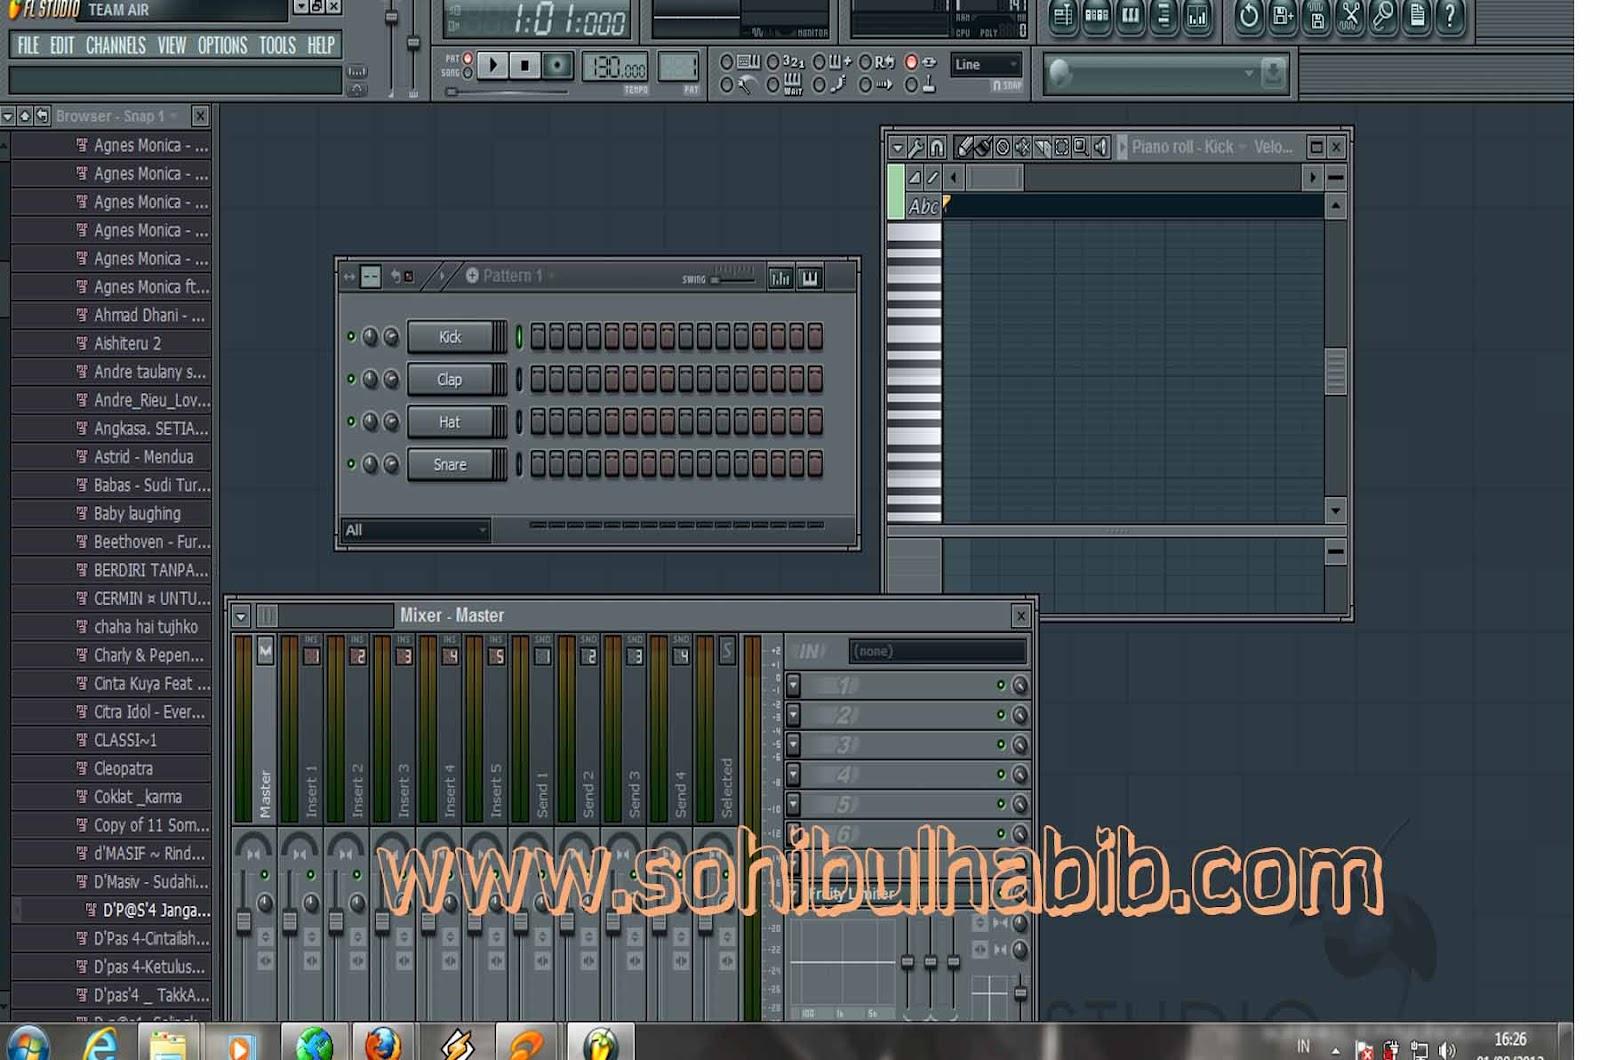 Fruity loops 9 crack | FL Studio 20 1 1 795 Crack Full